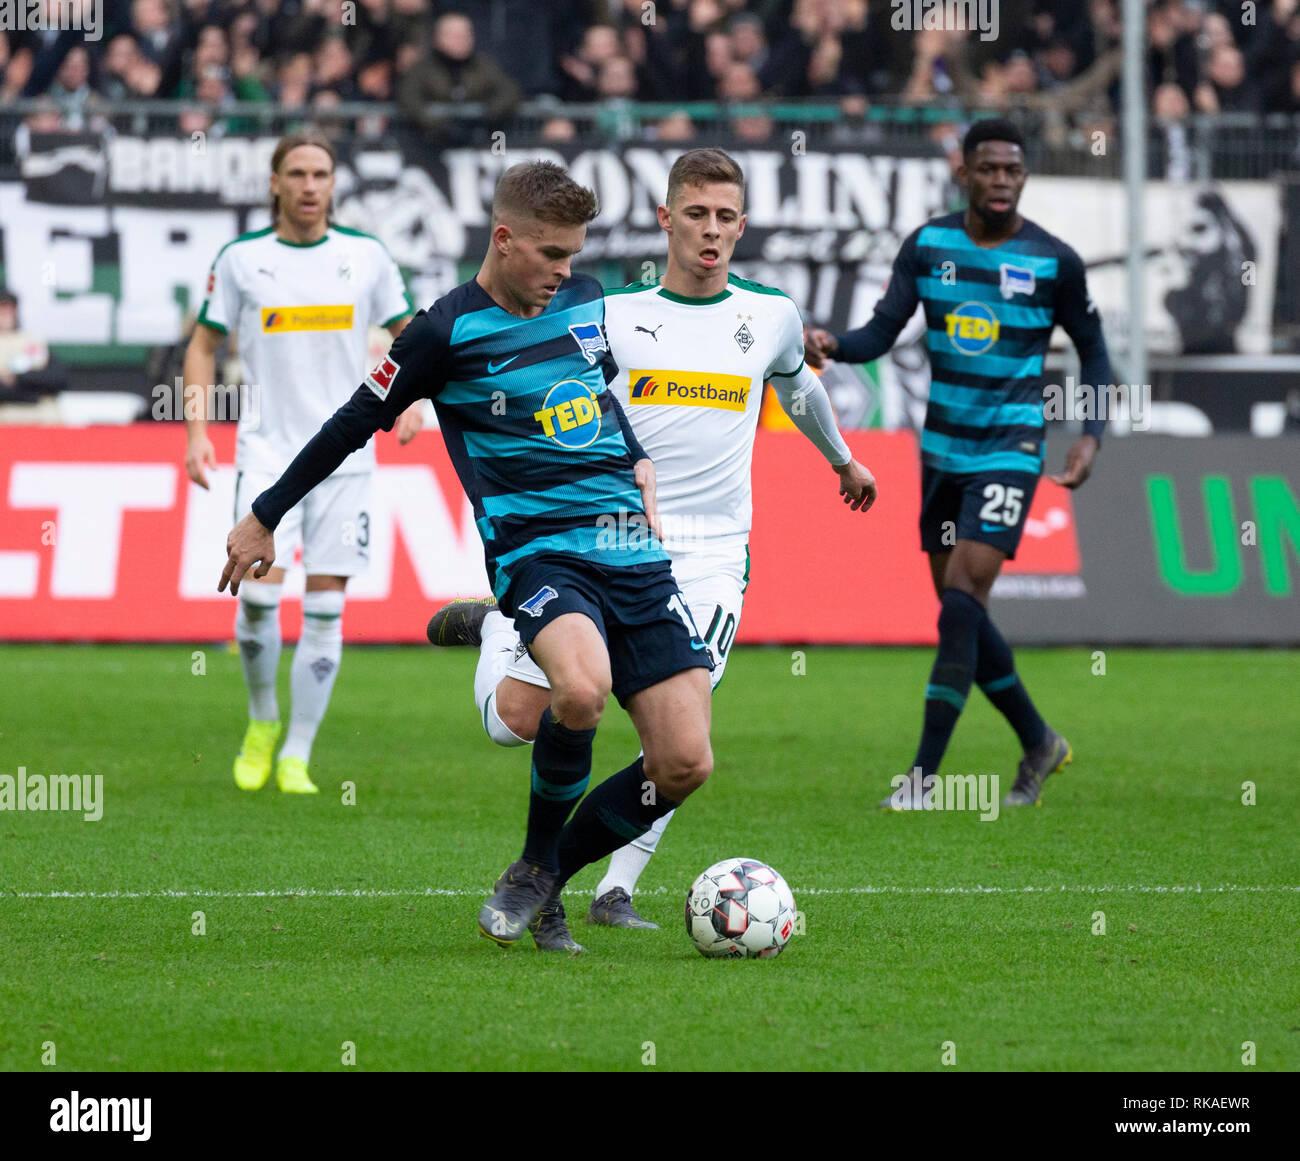 sports, football, Bundesliga, 2018/2019, Borussia Moenchengladbach vs Hertha BSC Berlin 0-3, Stadium Borussia Park, scene of the match, ahead Florian Neuhaus (MG) in ball possession, right Marko Grujic (Hertha), DFL REGULATIONS PROHIBIT ANY USE OF PHOTOGRAPHS AS IMAGE SEQUENCES AND/OR QUASI-VIDEO - Stock Image